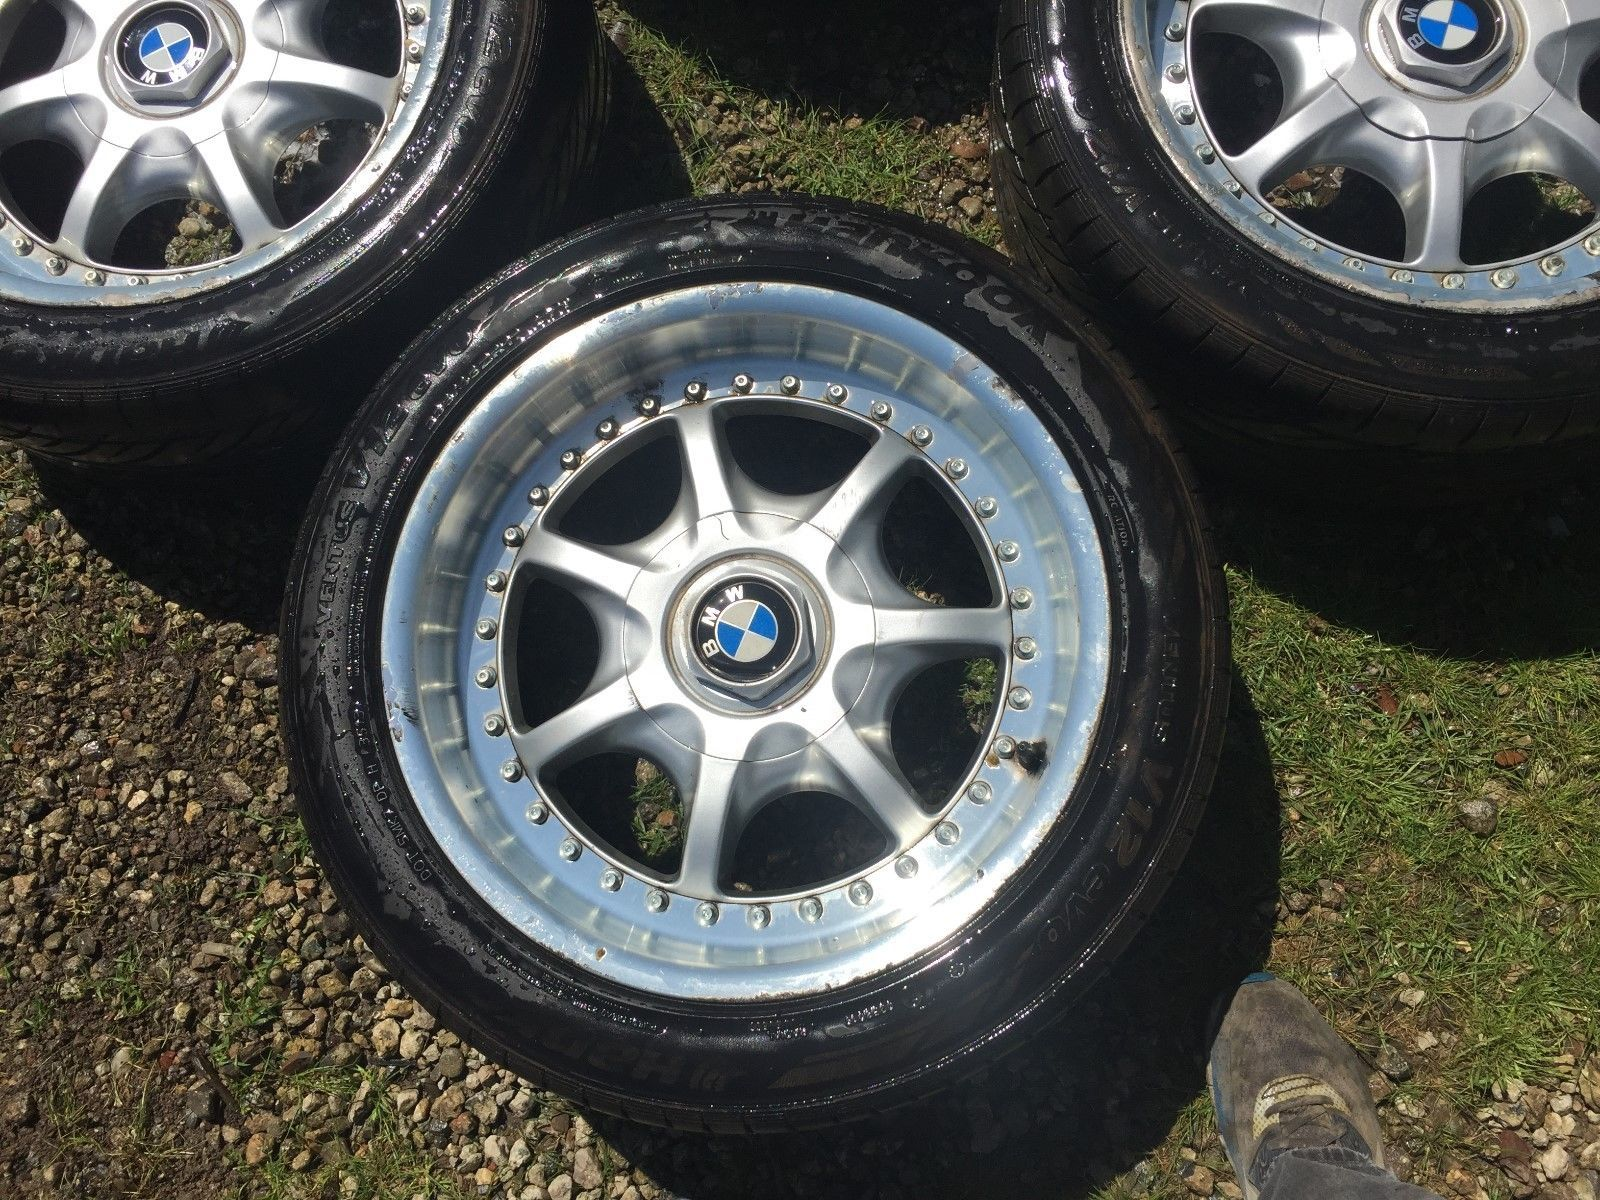 medium resolution of 1997 2003 bmw e39 sport wheels rims 540i 530i 525i 528i 535i bbs deep dish 17 ebay